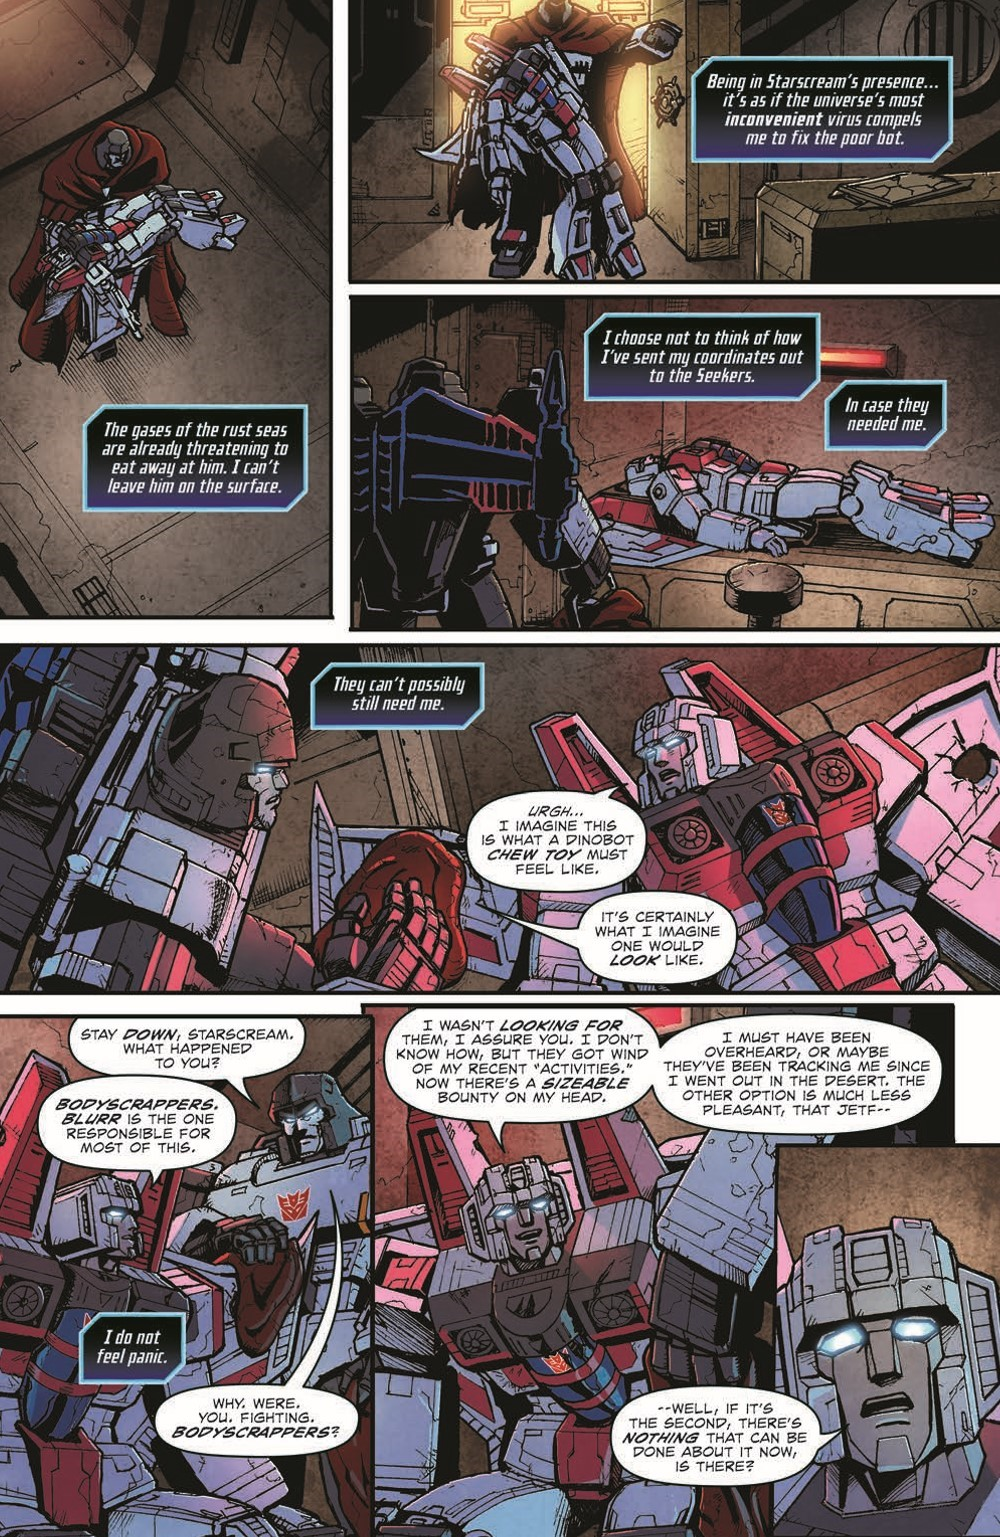 TF_ShatGlass02-pr-5 ComicList Previews: TRANSFORMERS SHATTERED GLASS #2 (OF 5)